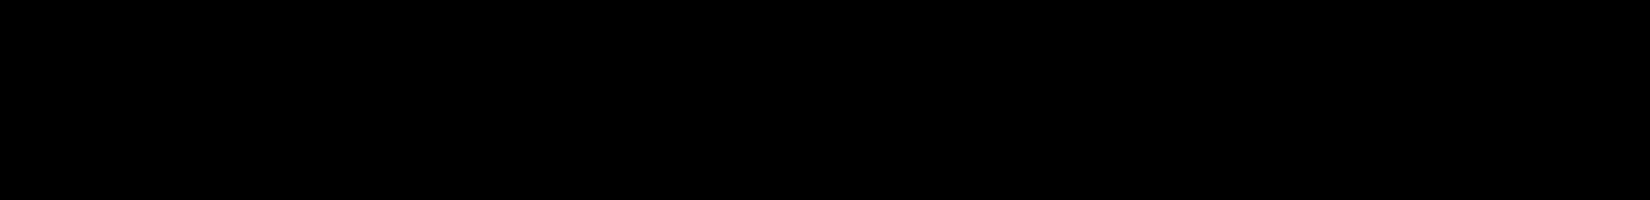 affiliated-to-VCUKI_logo-registeredTM